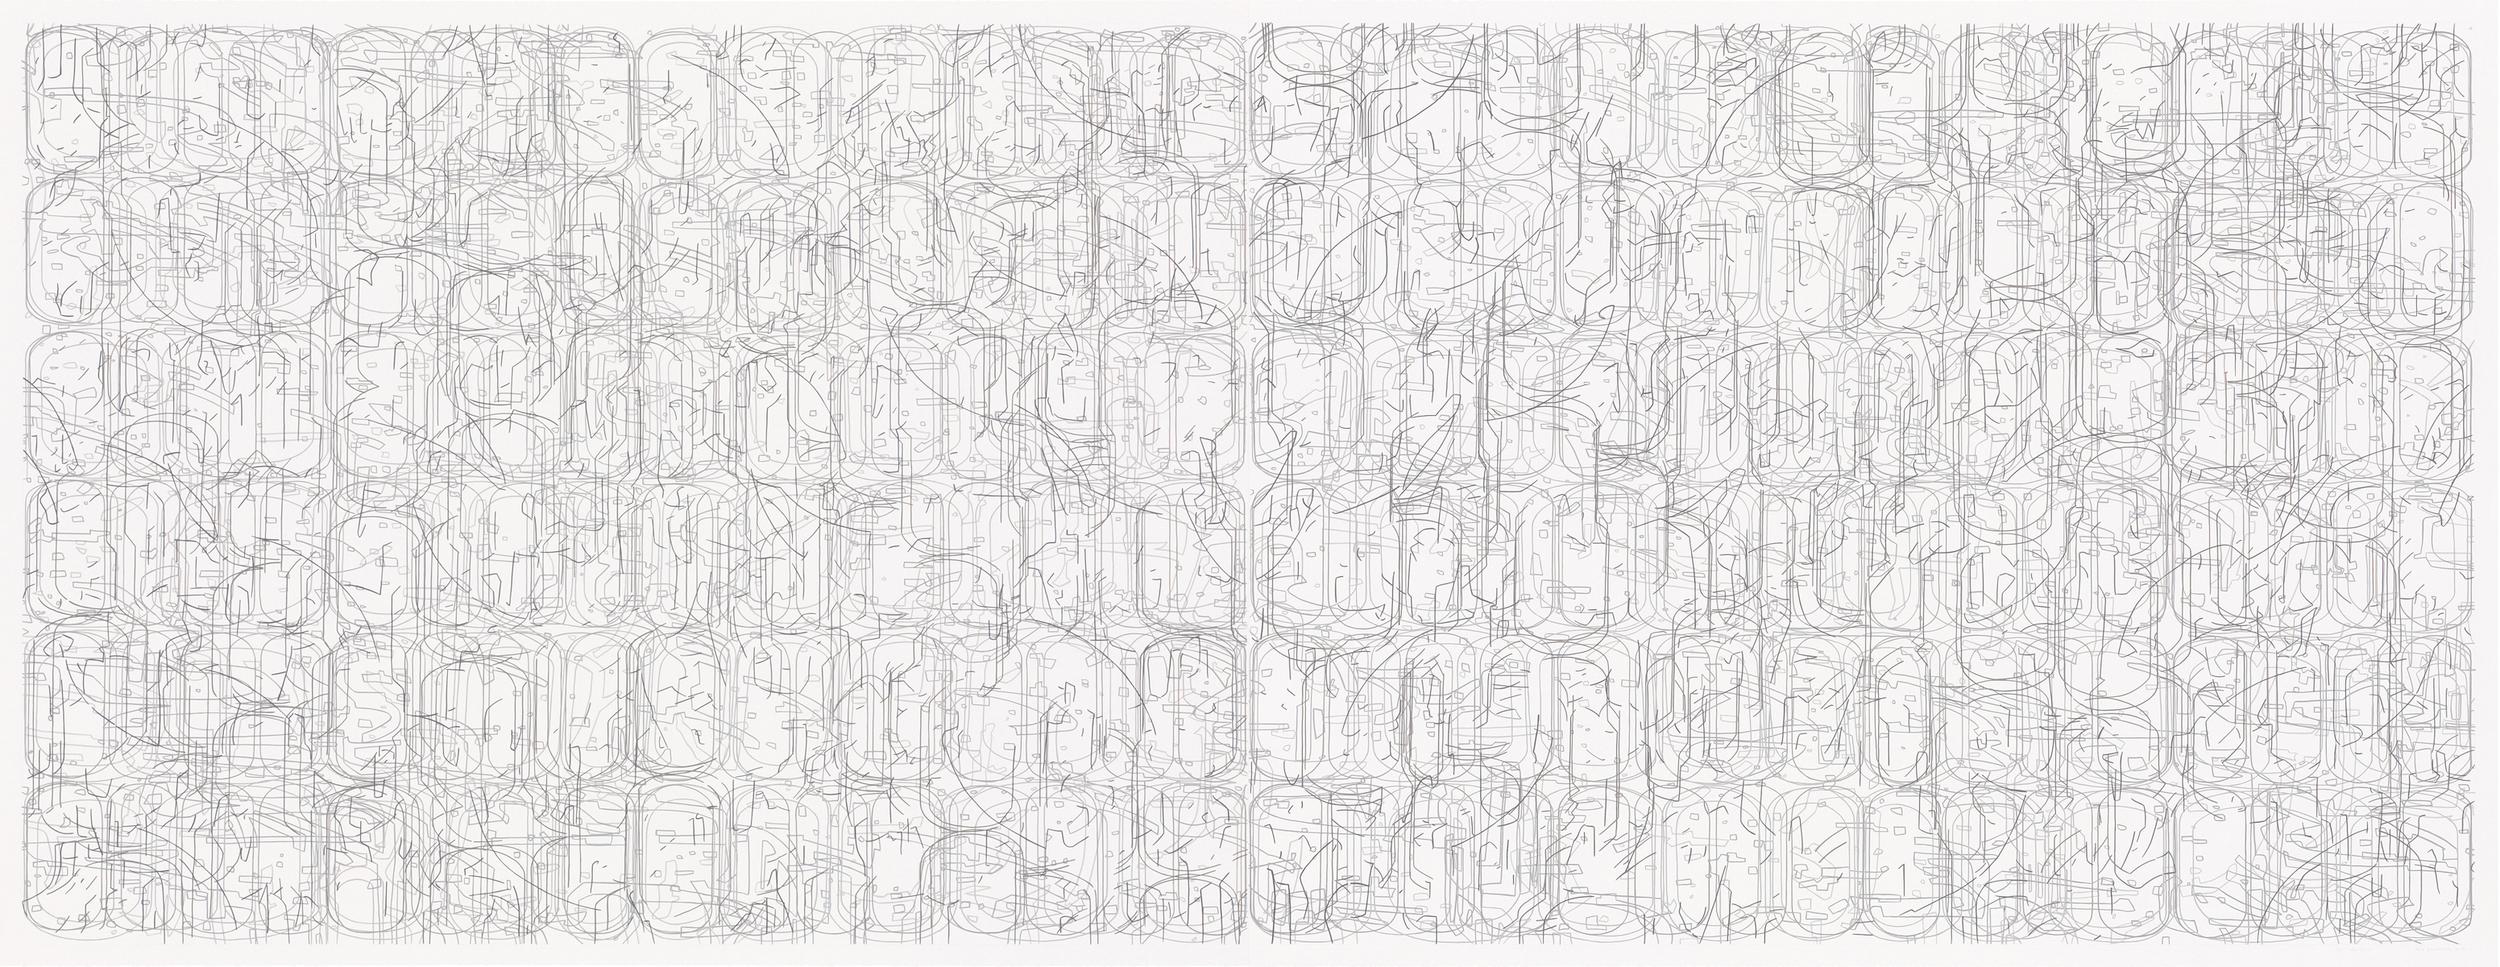 "No. 070308.01, 2008 Gouache on Rising Stonehenge paper 38"" x 98"" (42"" x 102"" framed)"